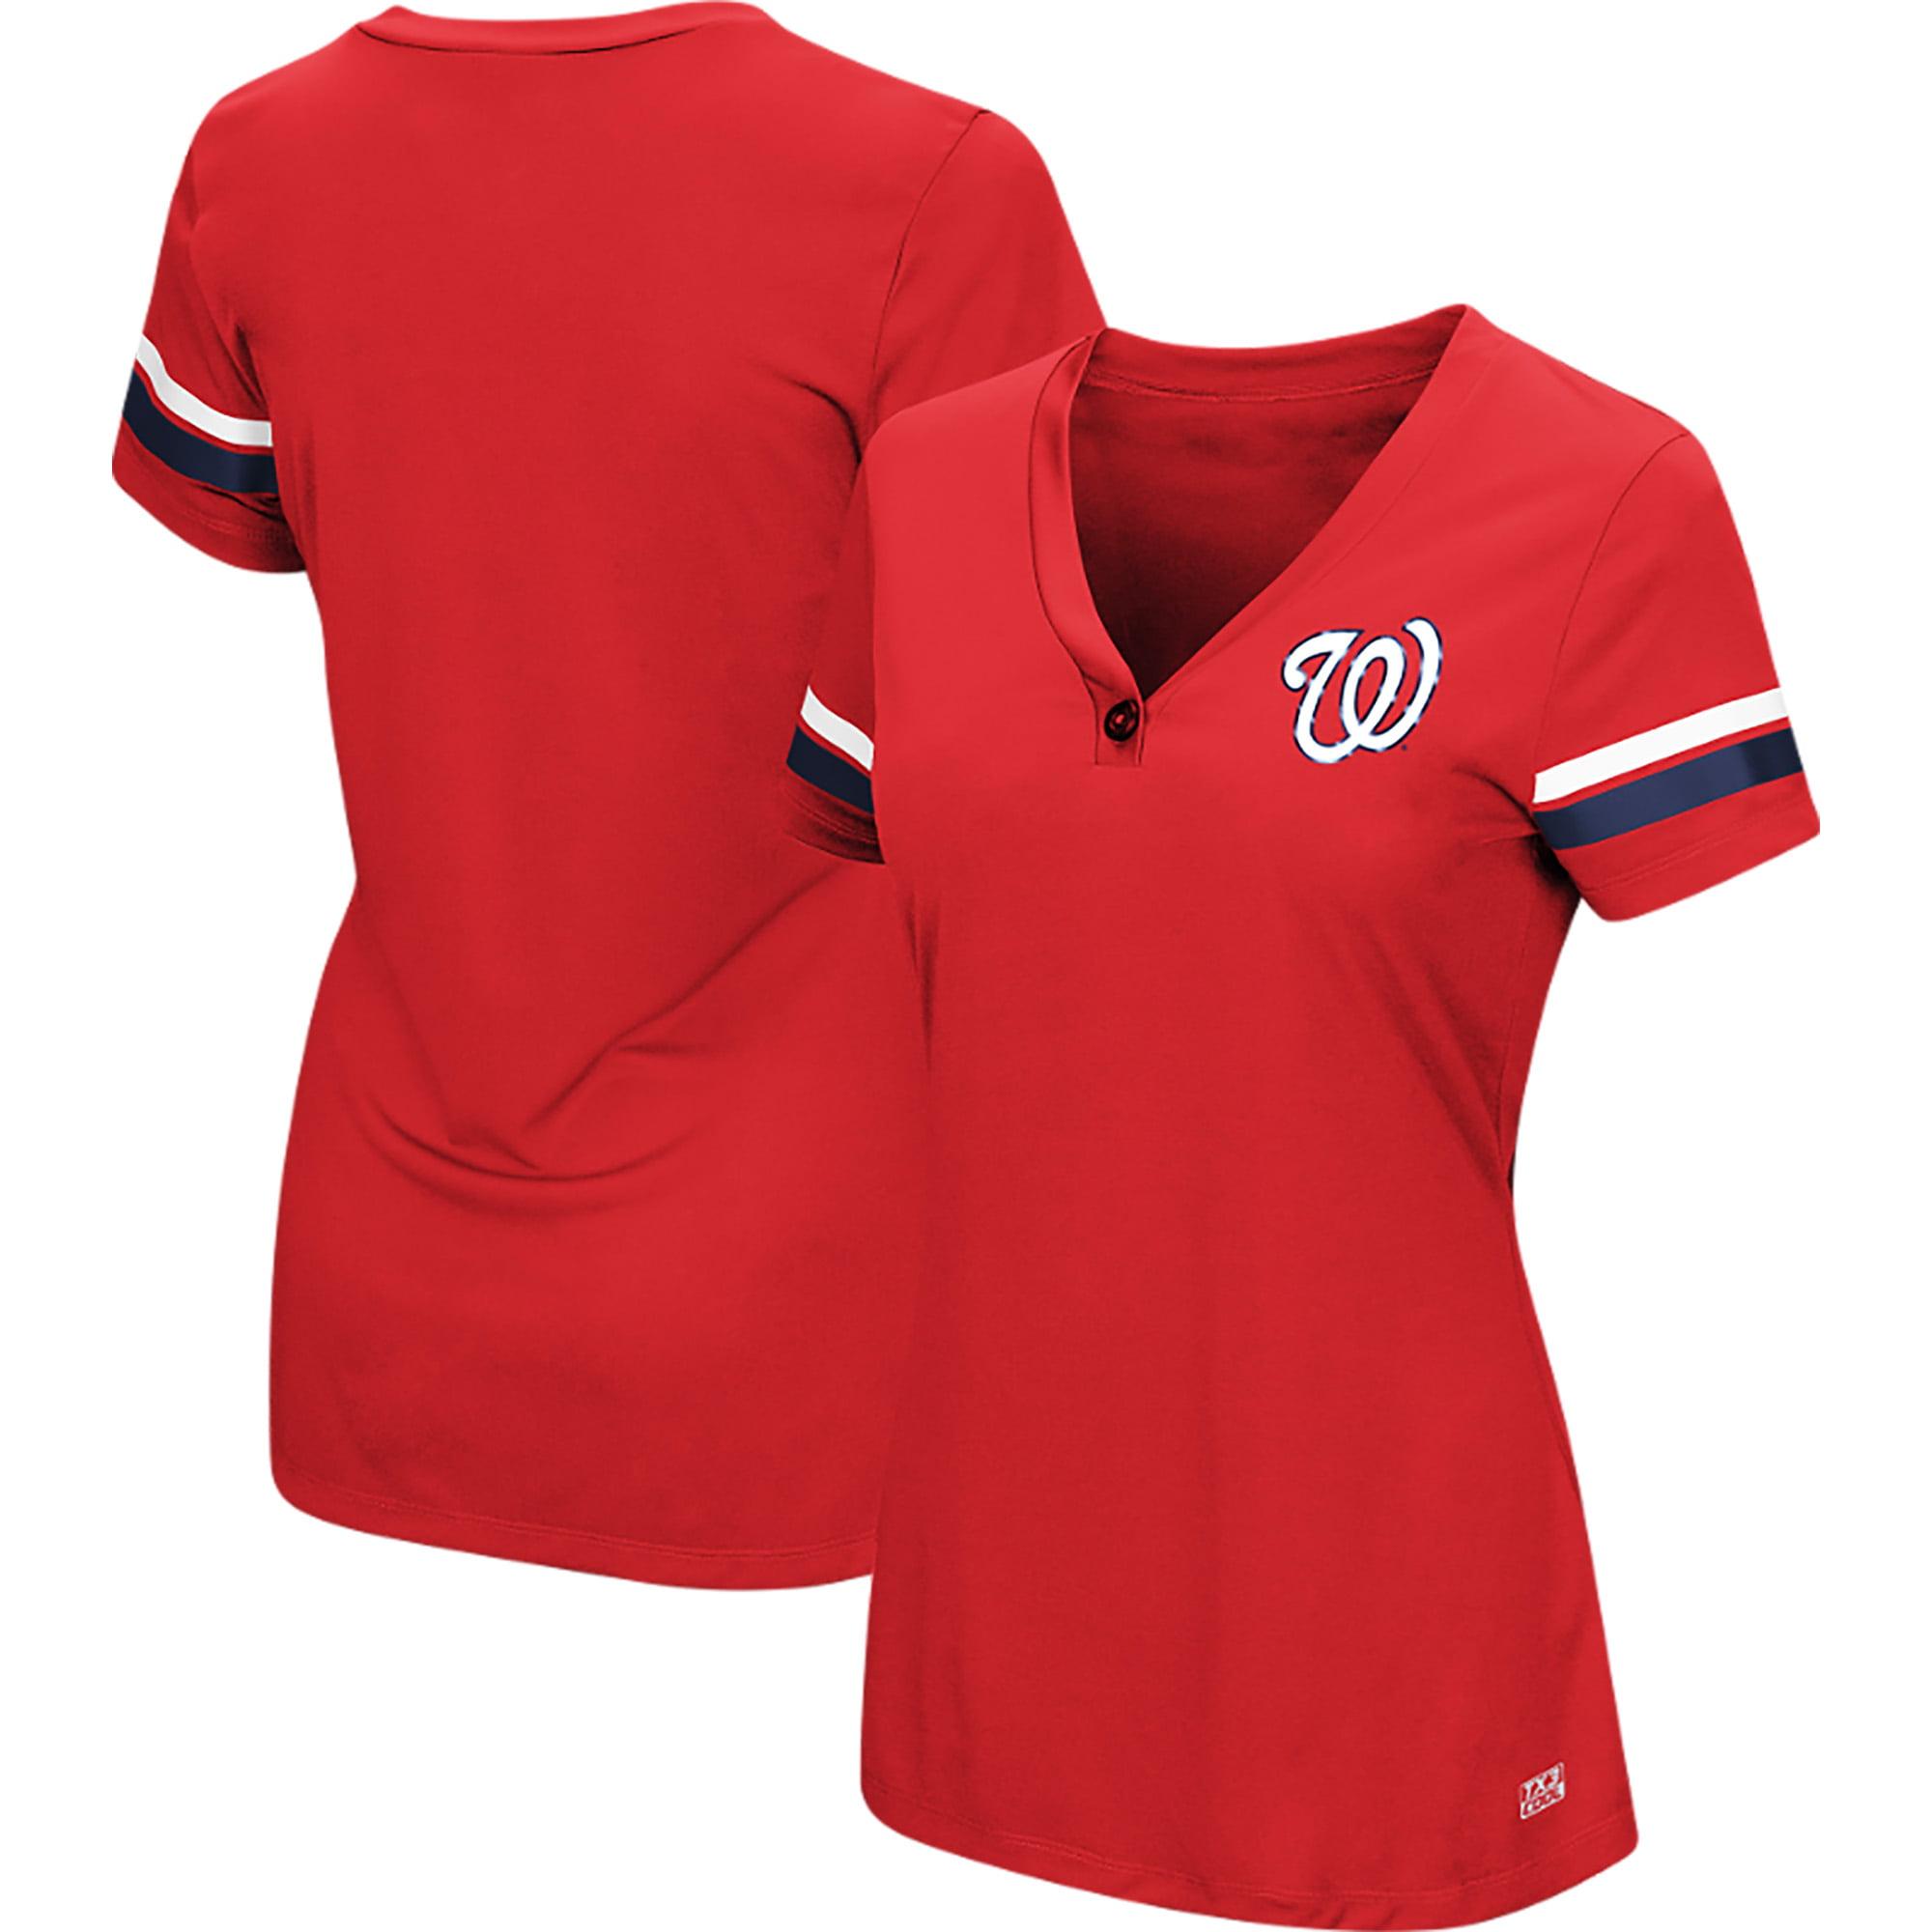 Women's Majestic Red Washington Nationals Plus Size Sparkling Fun Button V-Neck T-Shirt